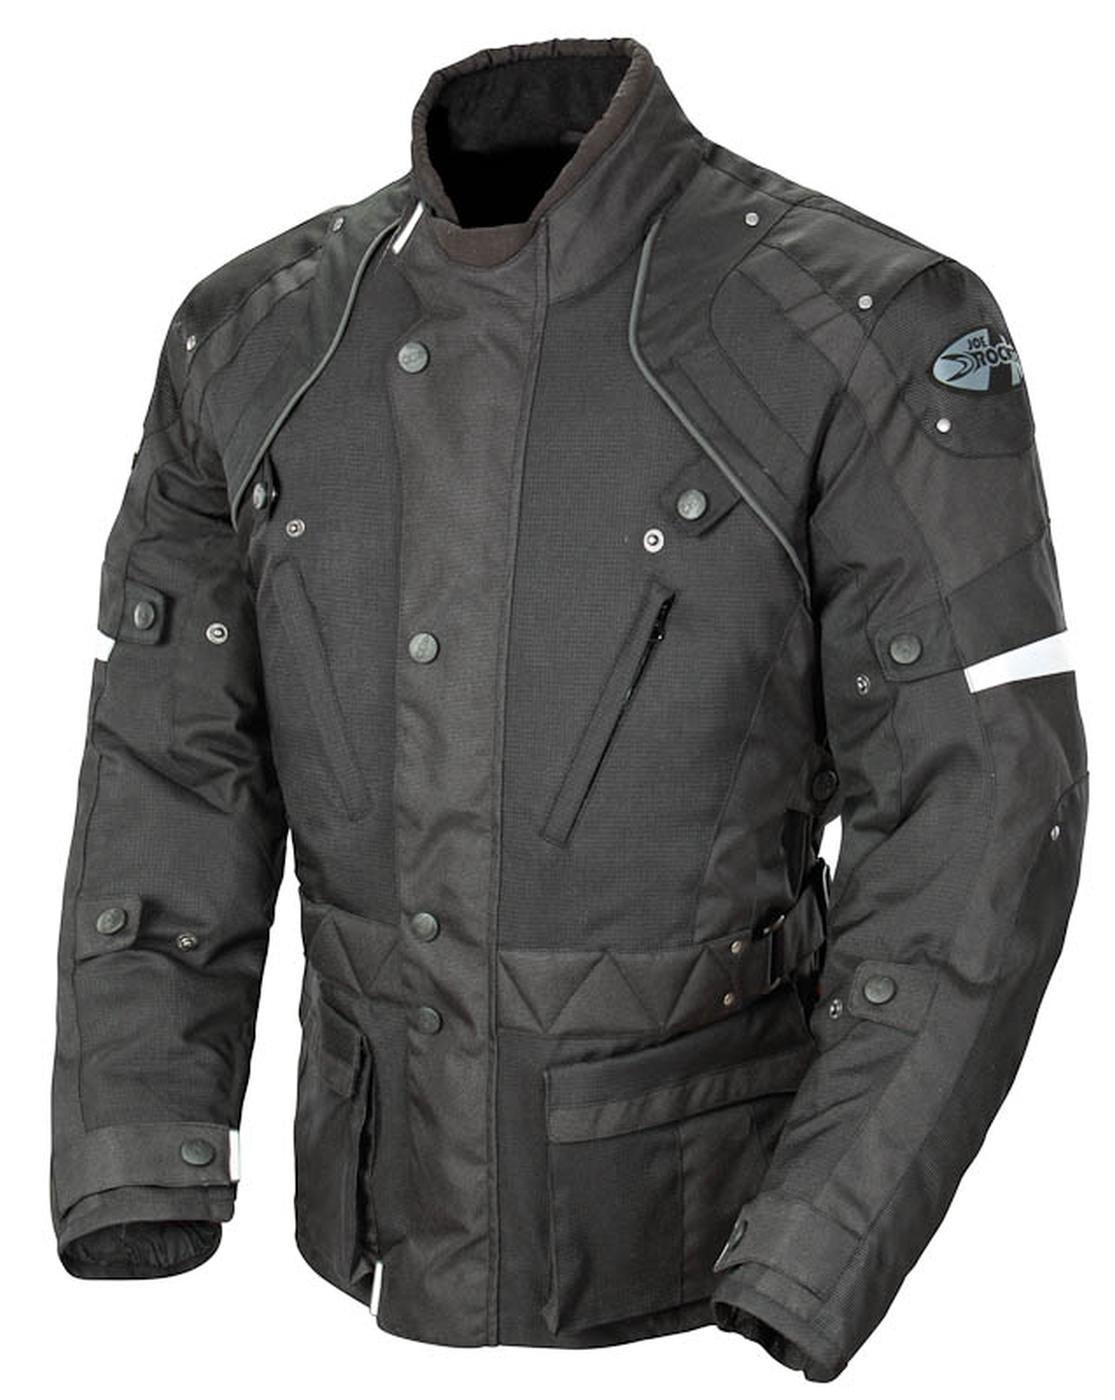 Joe Rocket Ballistic Revolution Men's Textile Sports Bike Motorcycle Jacket - Black/Black / Small